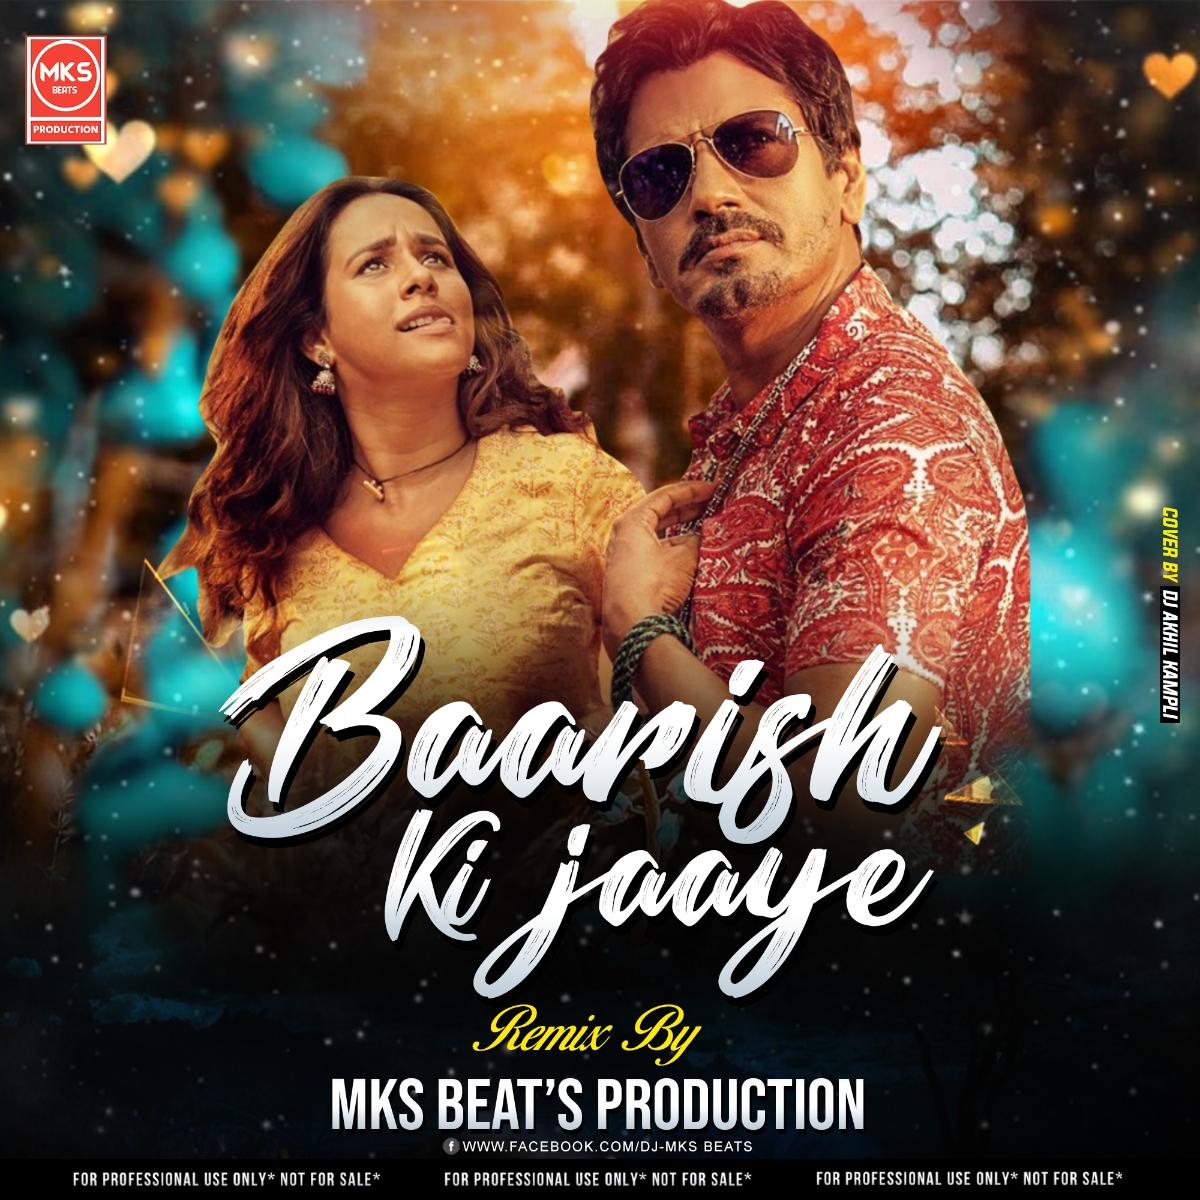 Baarish Ki Jaaye Remix - Mks Beats Production